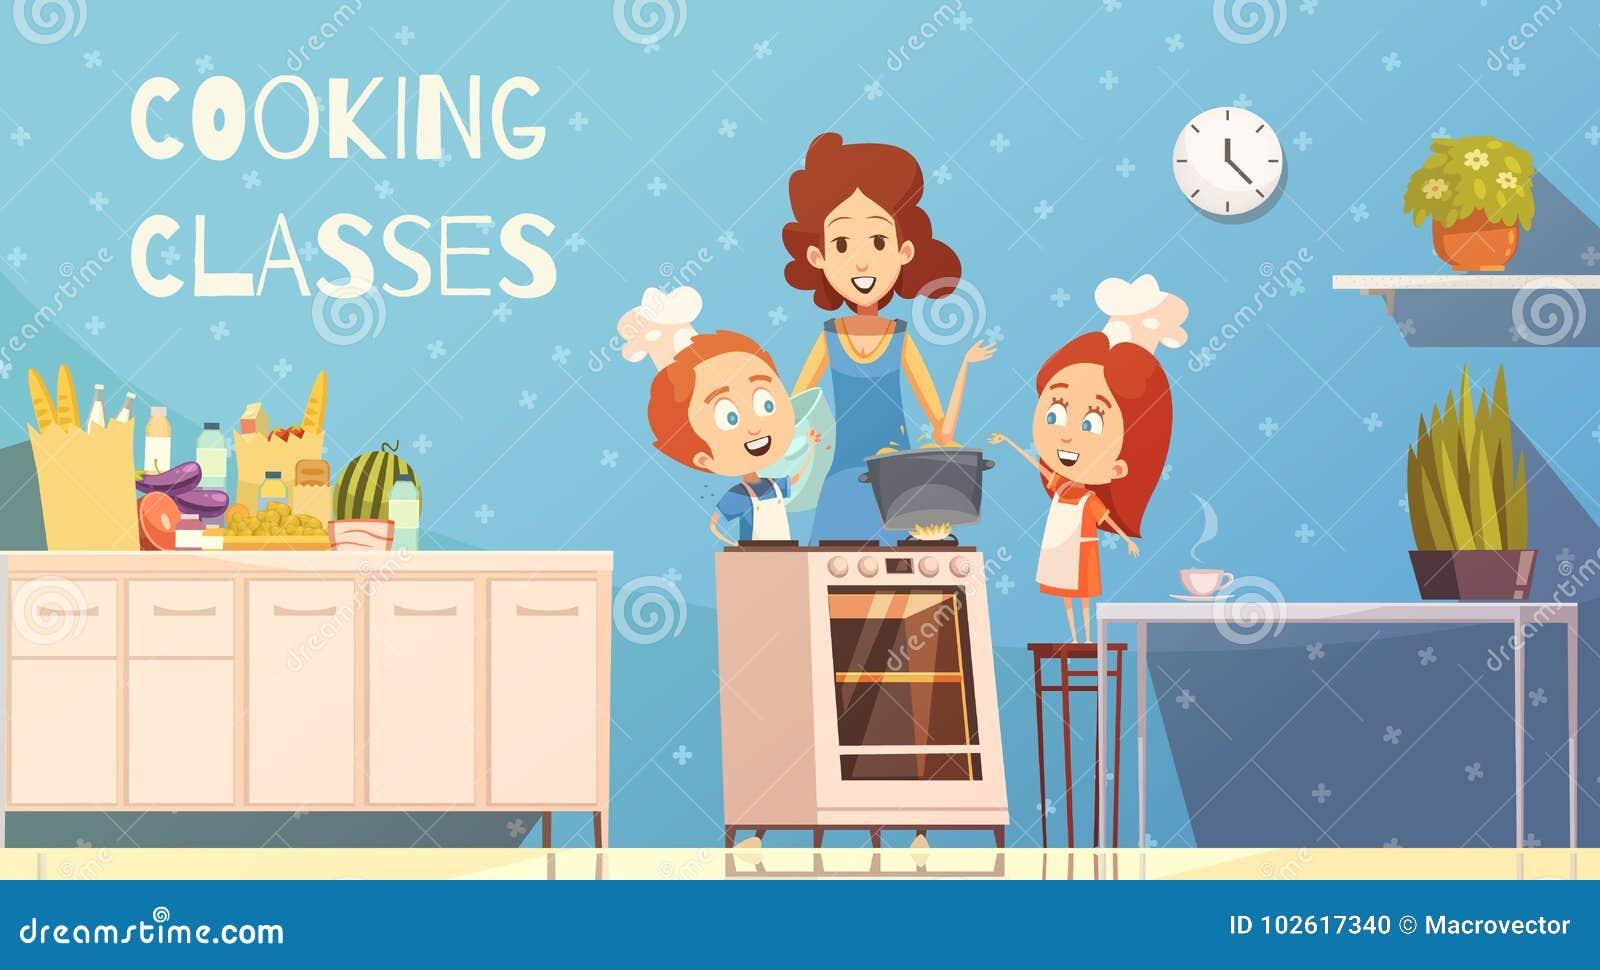 Cooking Classes For Children Vector Illustration Stock Vector ...